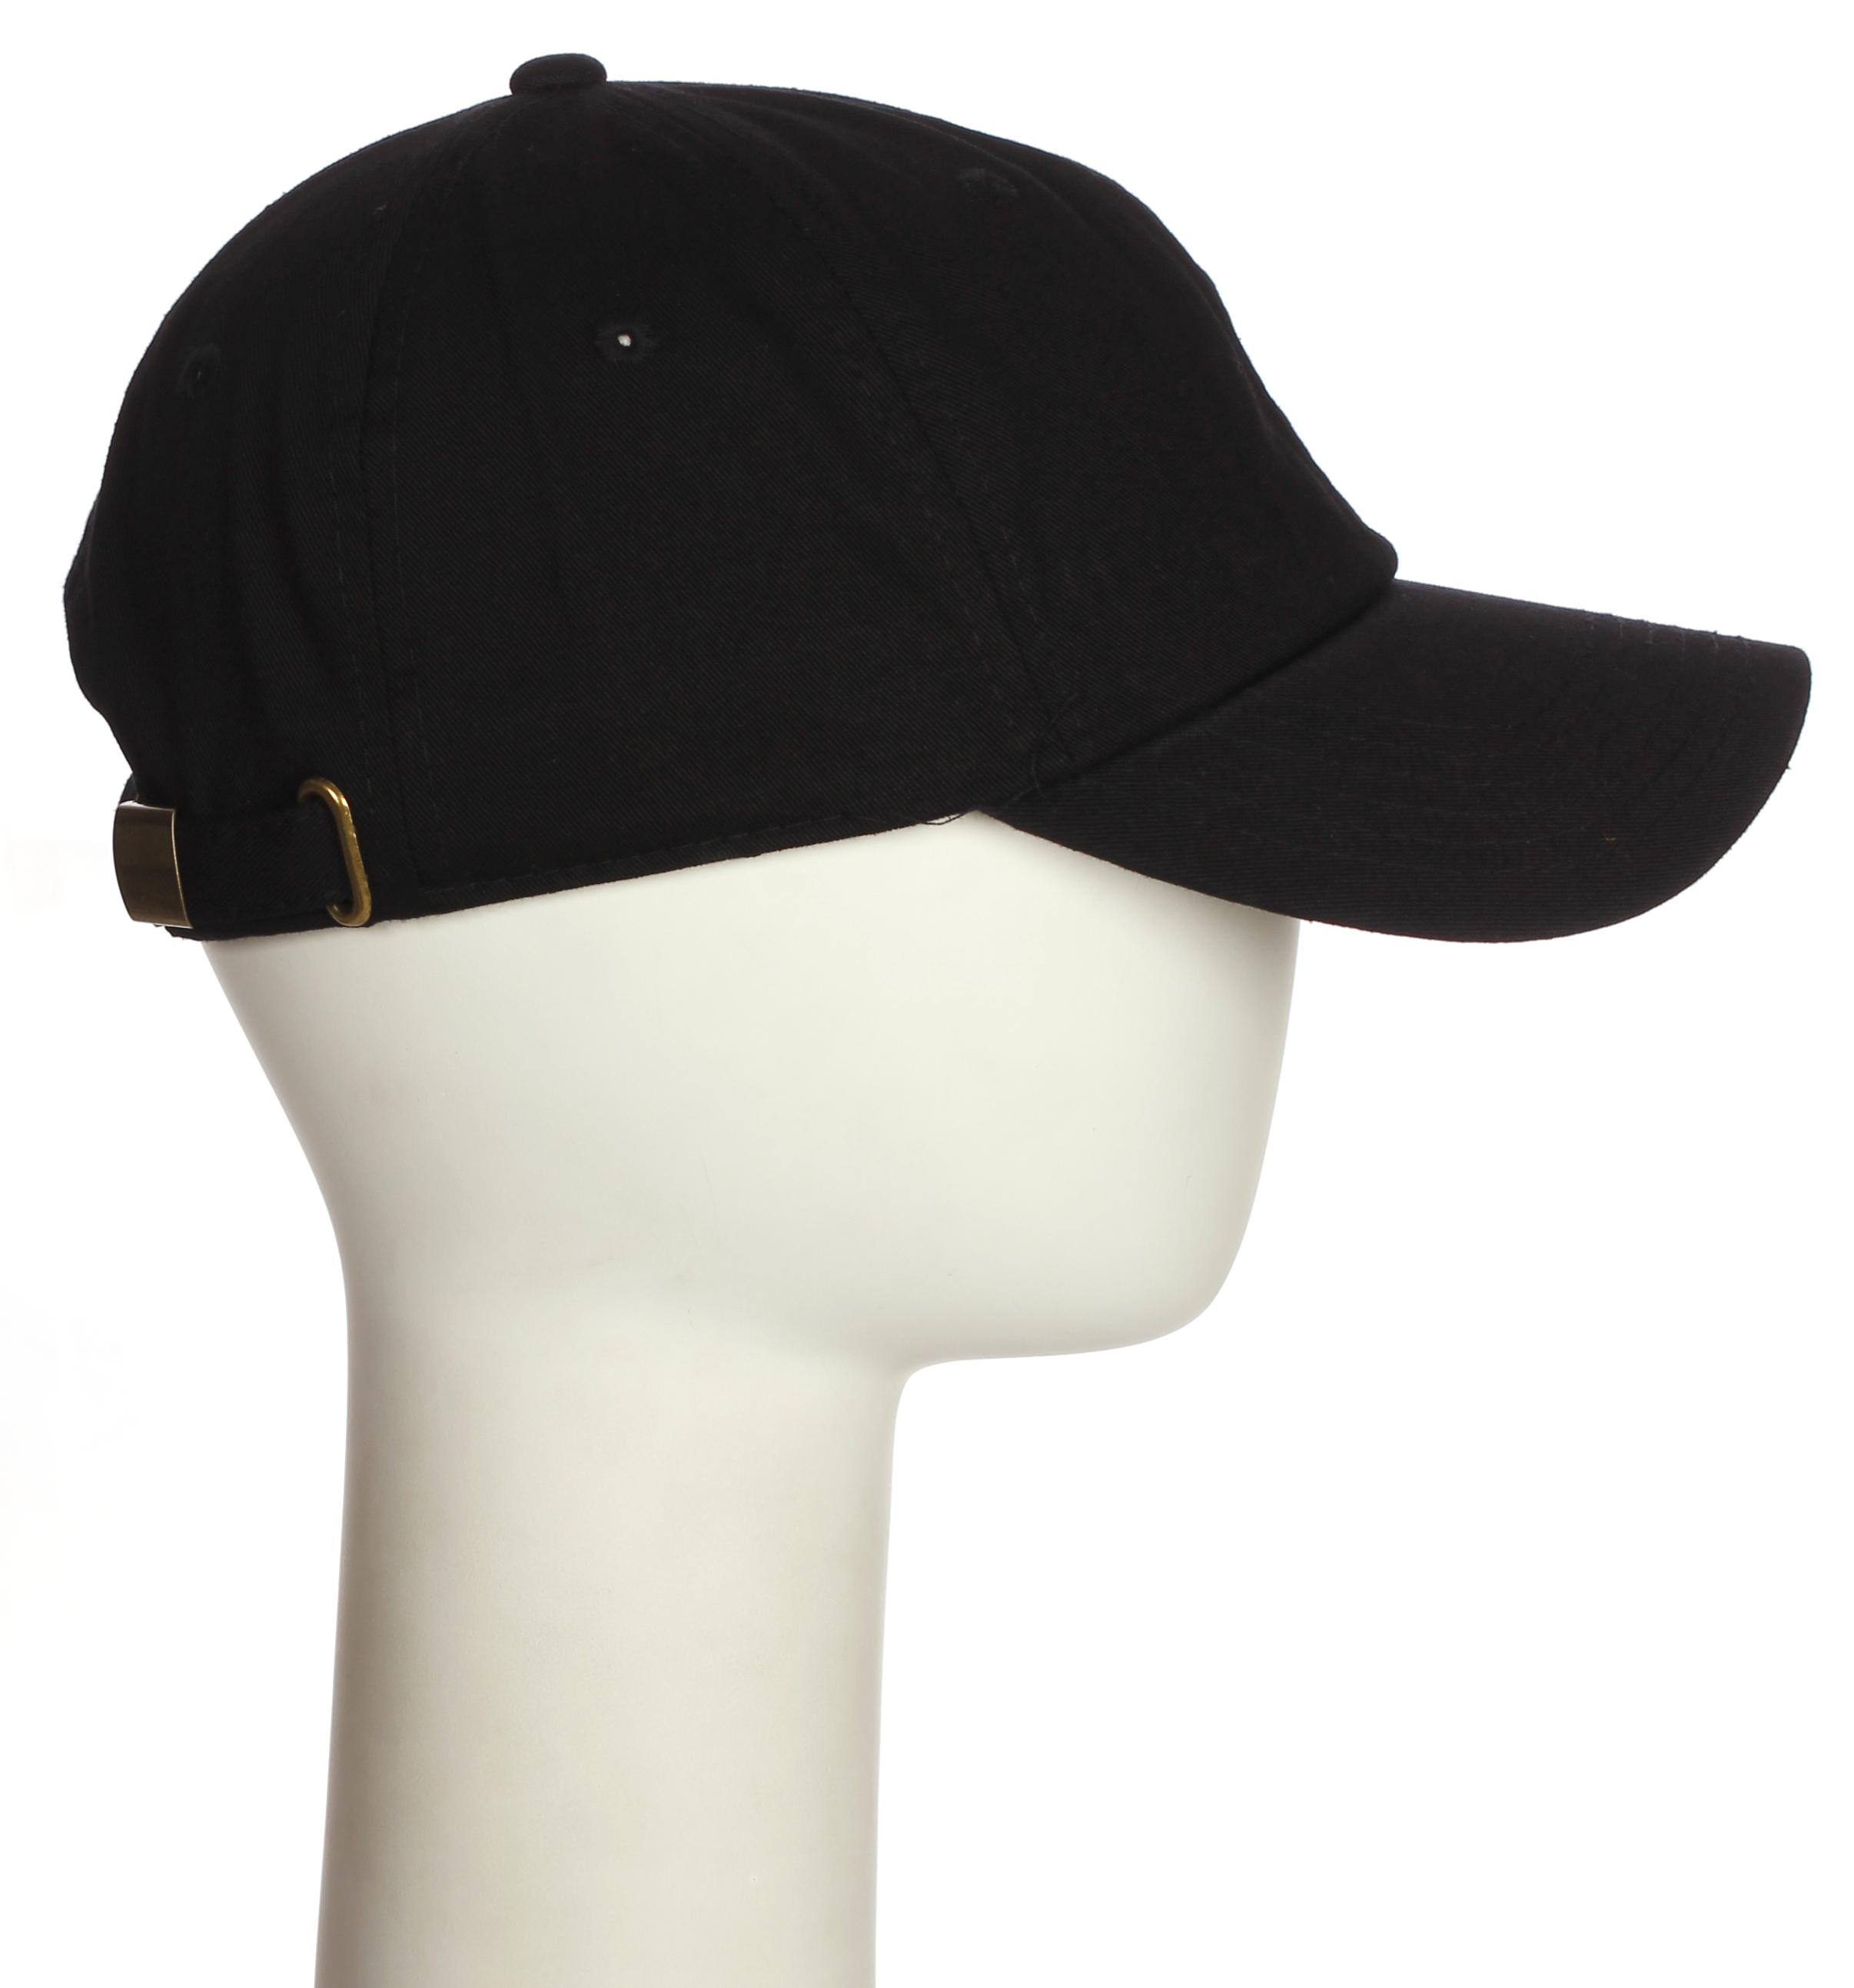 2e043c2d44731 Classic Baseball Cap Hat 3D Raised Initial Letters - Black Hat White ...